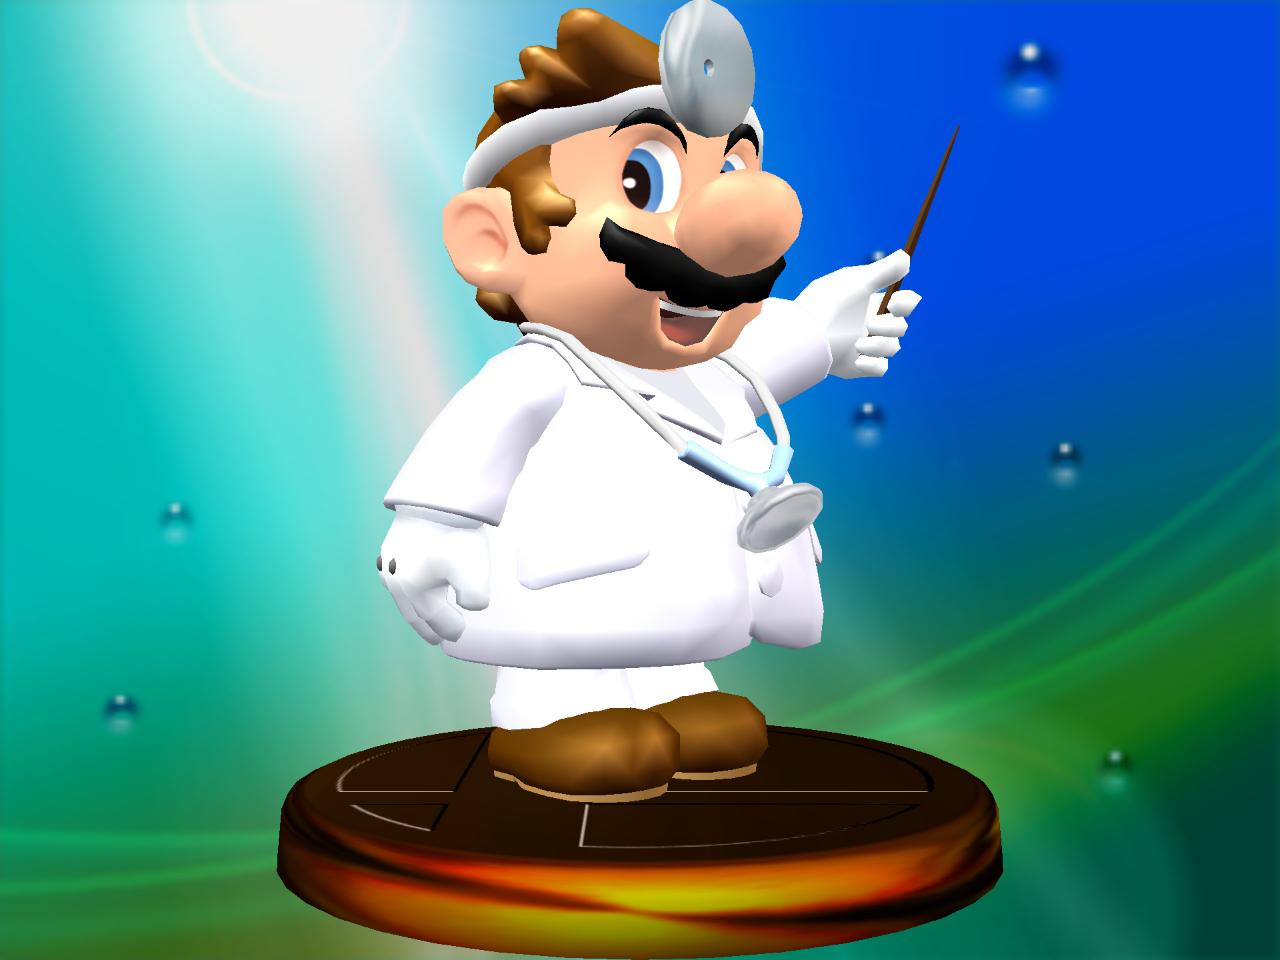 Dr. Mario (Super Smash Bros. Melee)